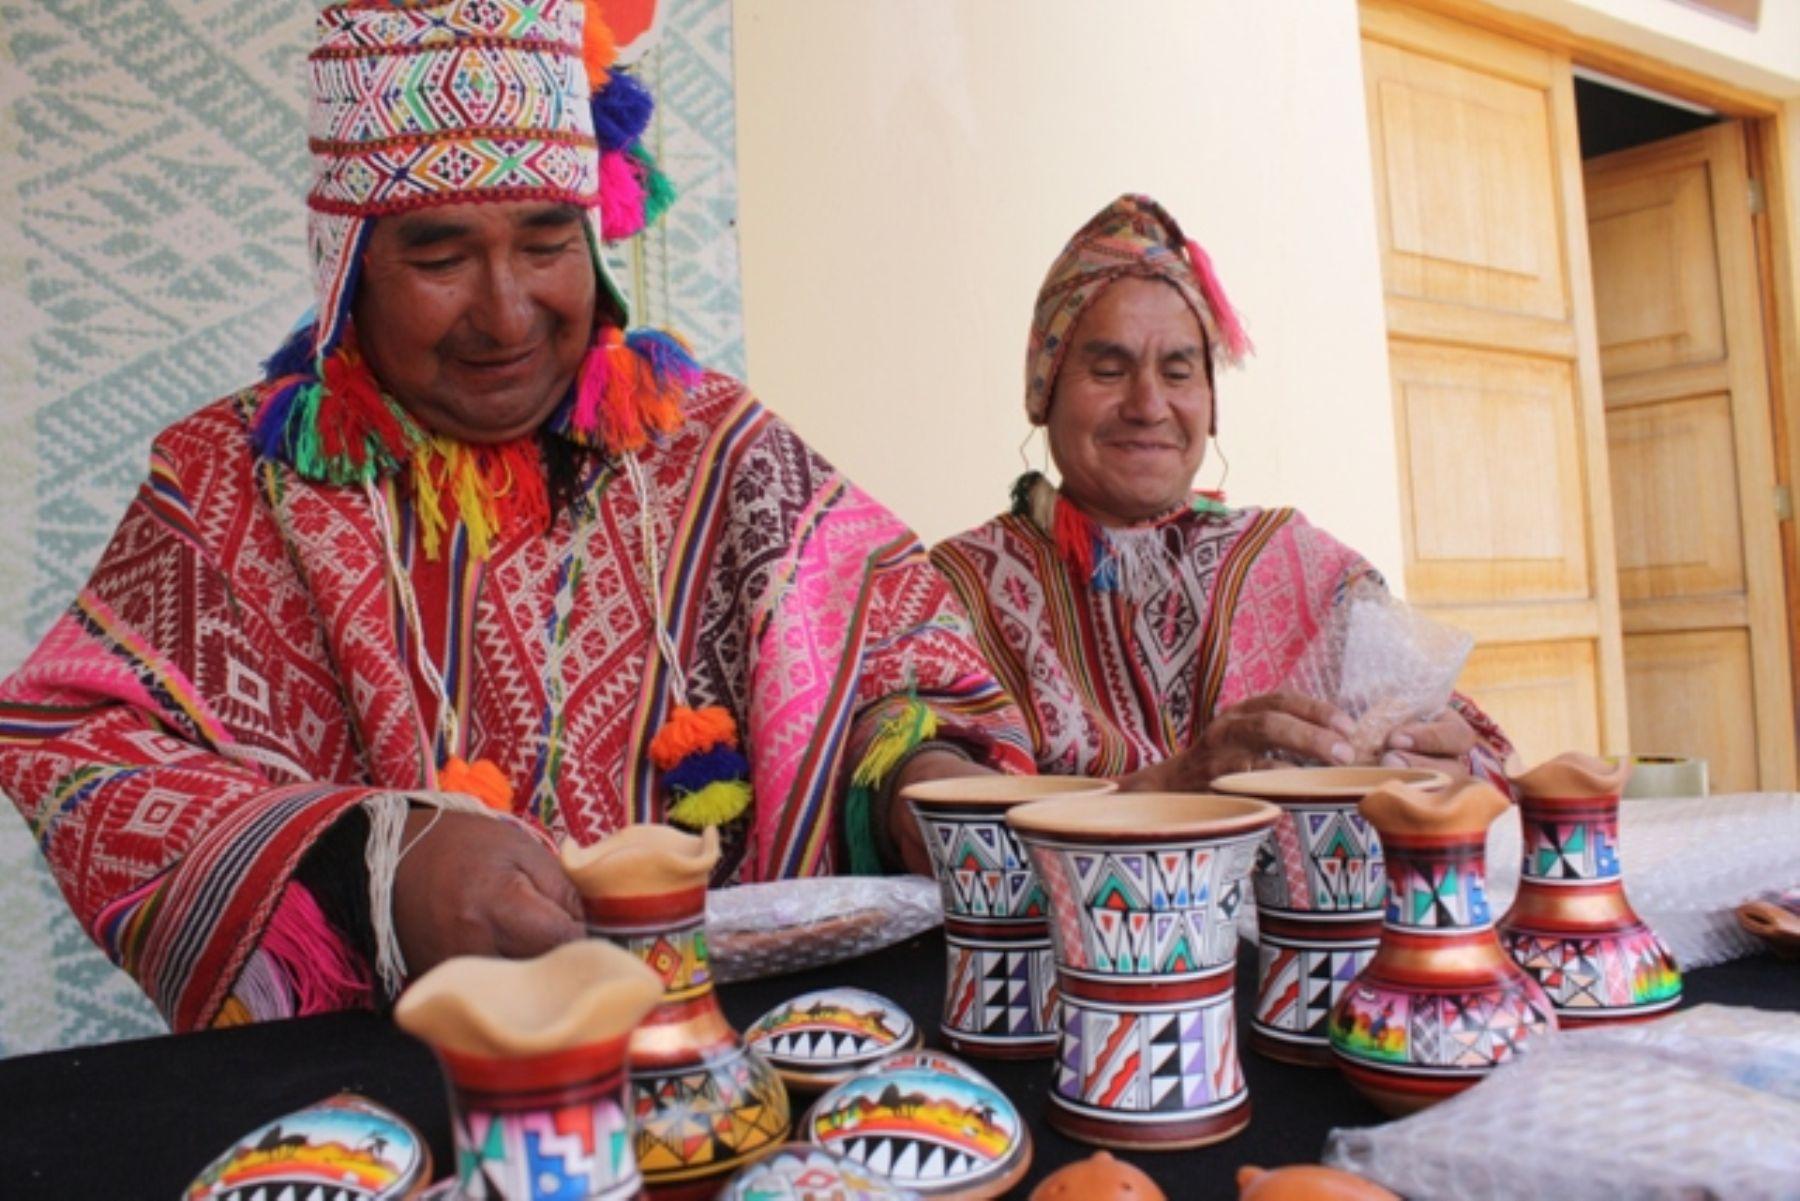 Artesanos emprendedores exponen trabajos emprendedorestv for Ceramica artesanal peru